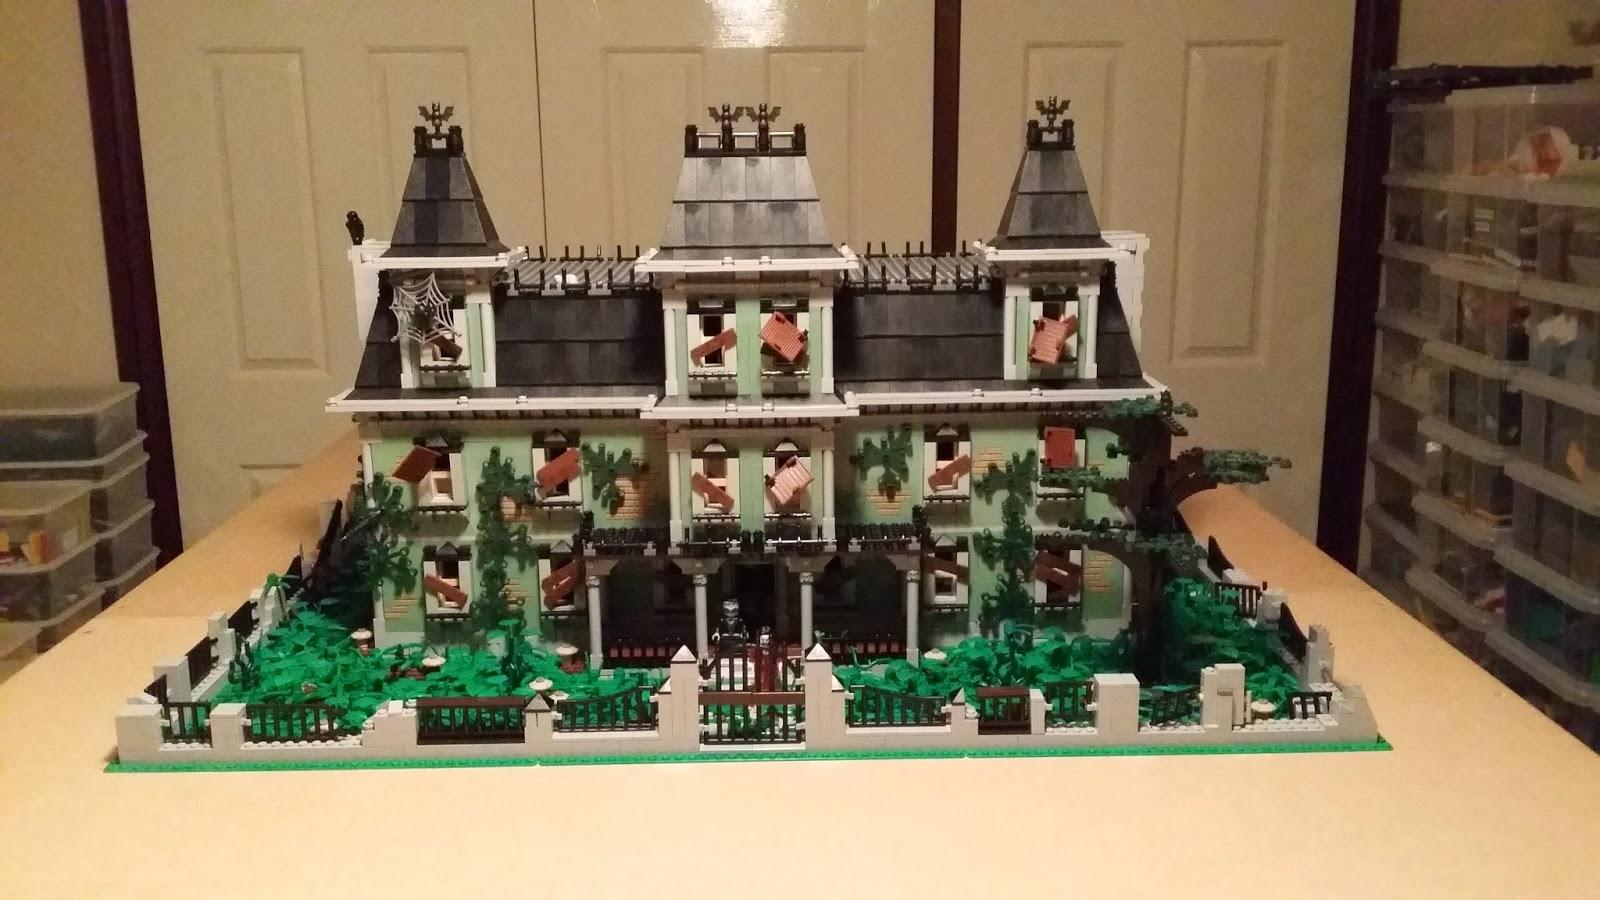 Matt S Lego Fun The Haunted Mansion